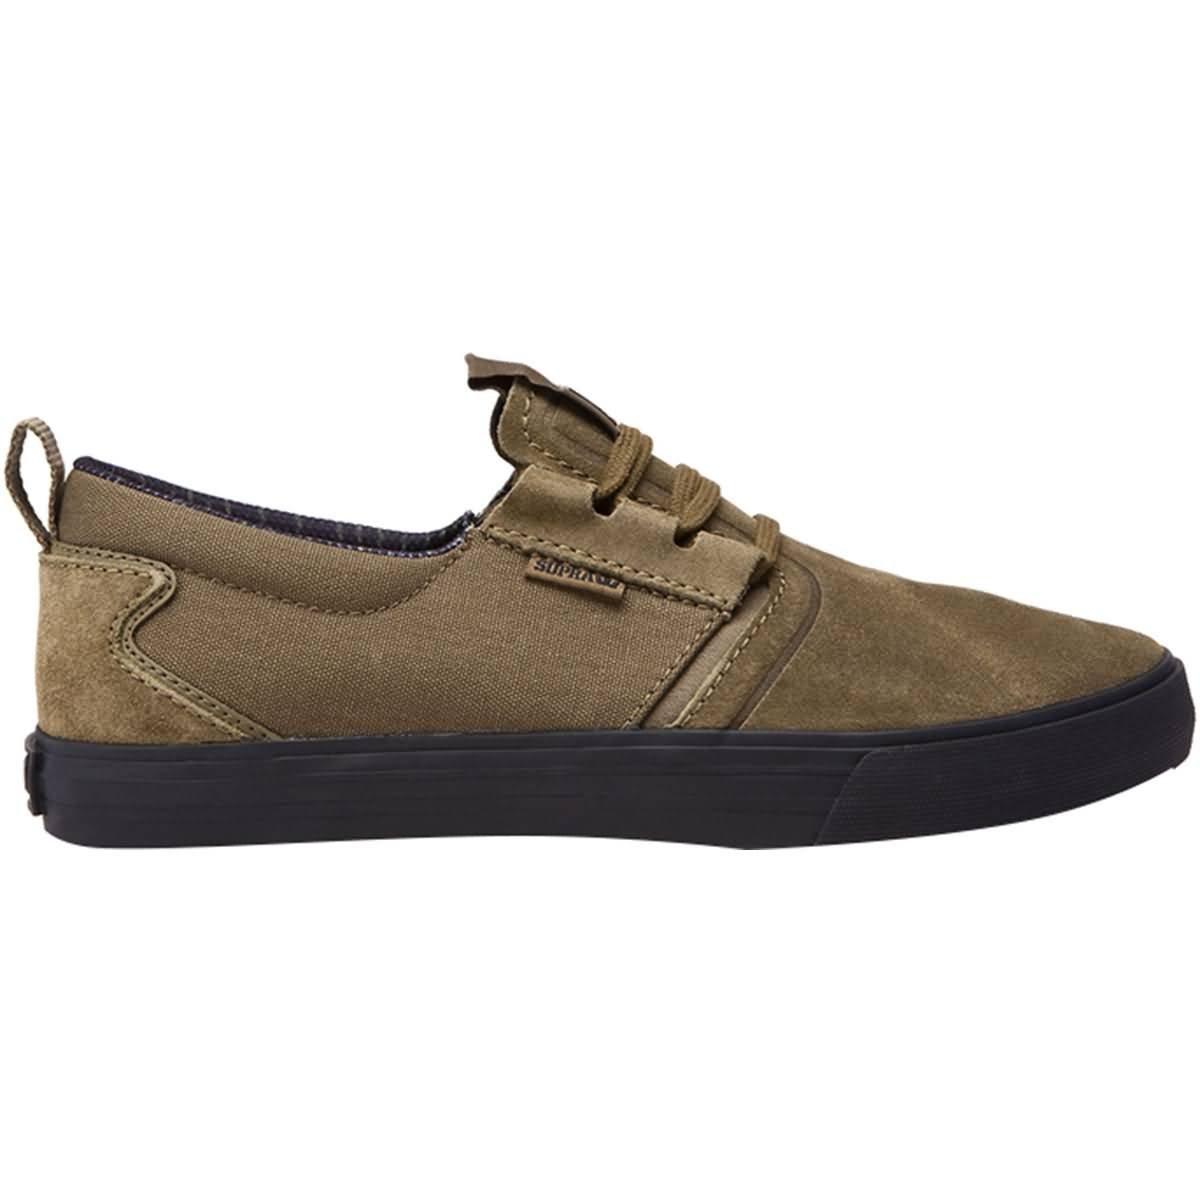 Supra Men's Flow Shoes 9 M US|Olive-black